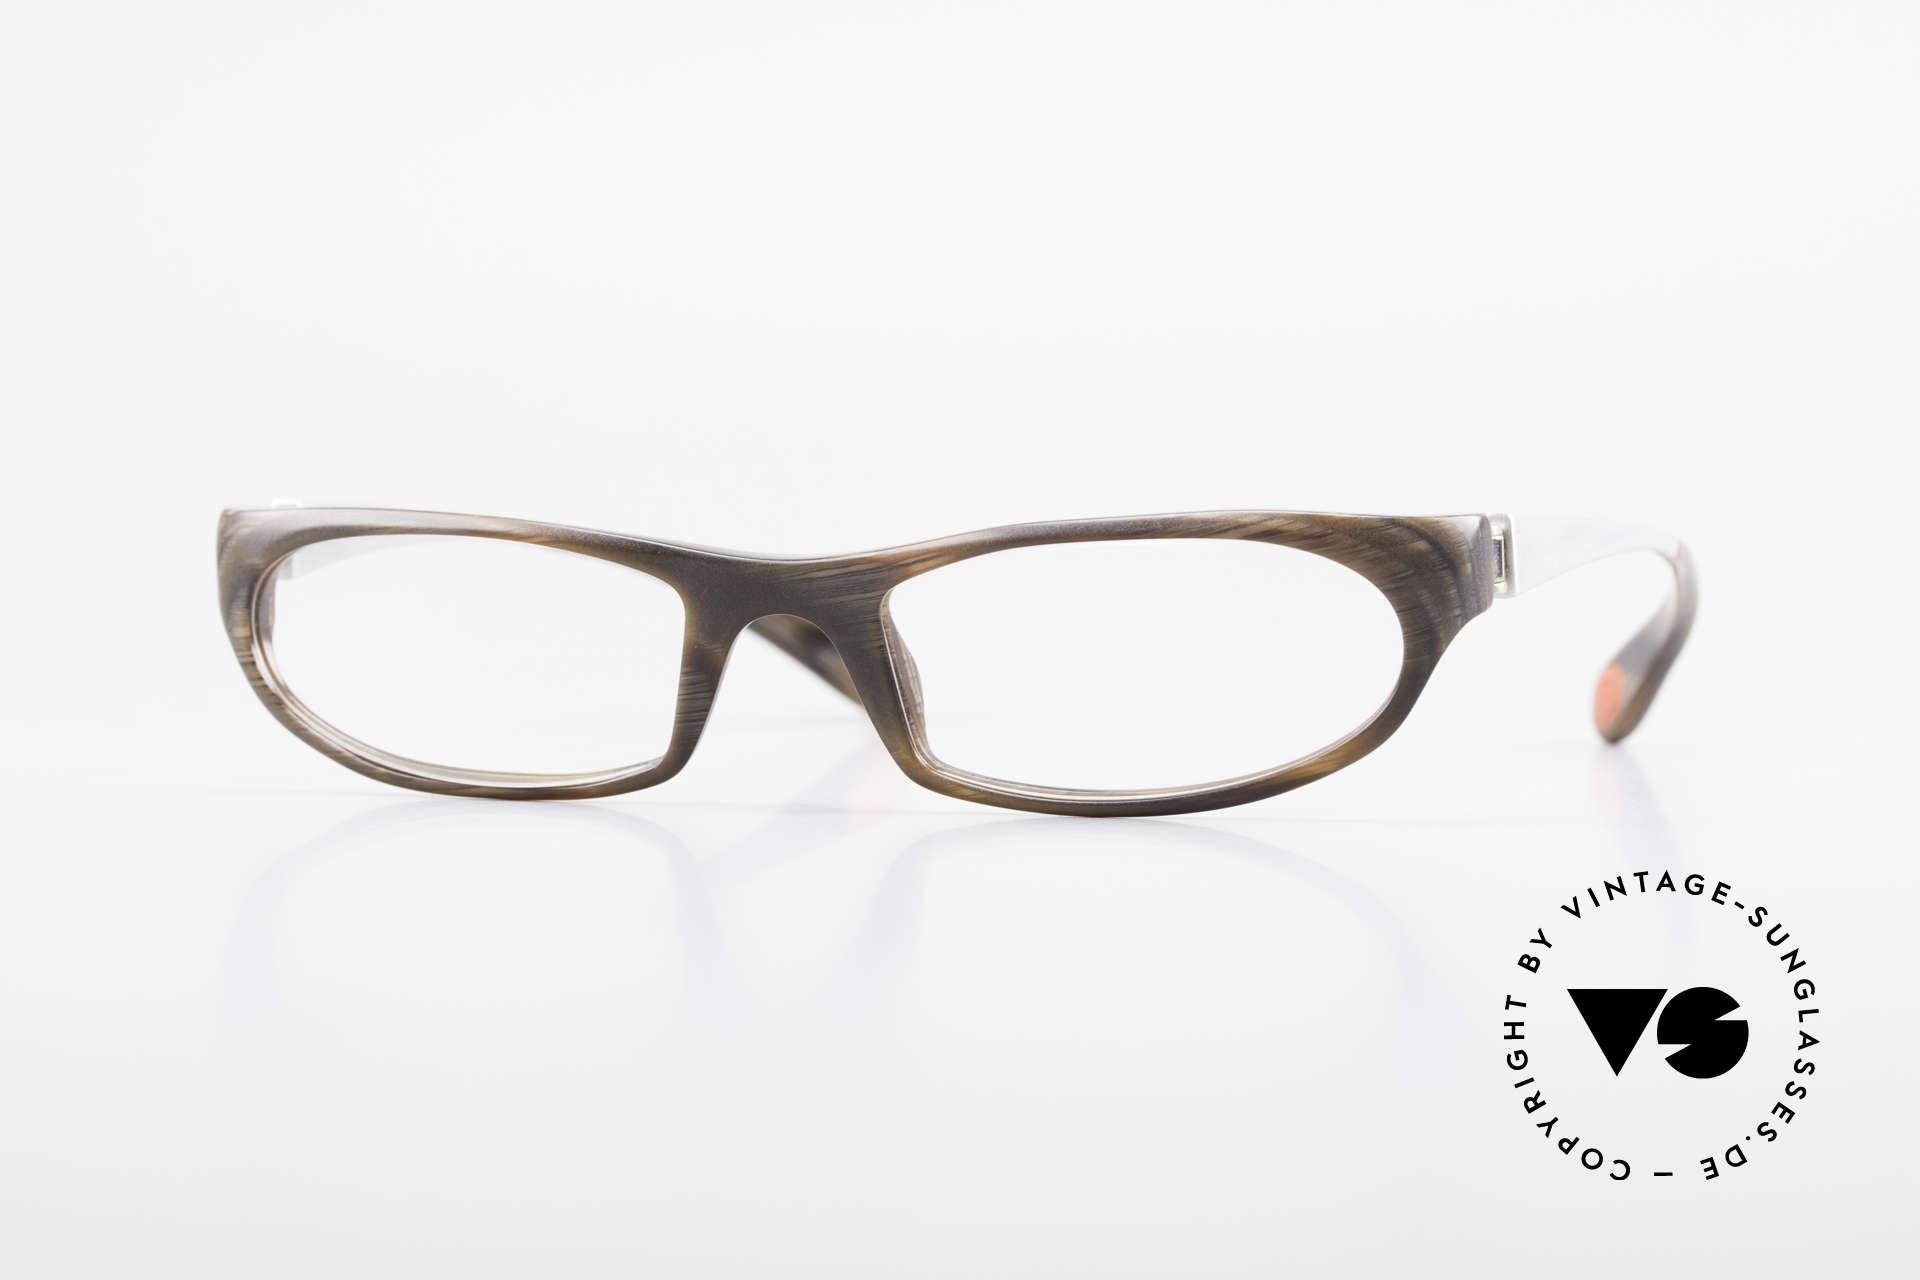 Bugatti 390 Odotype Luxury Designer Glasses Men, sporty BUGATTI high-tech eyeglass-frame, Made for Men